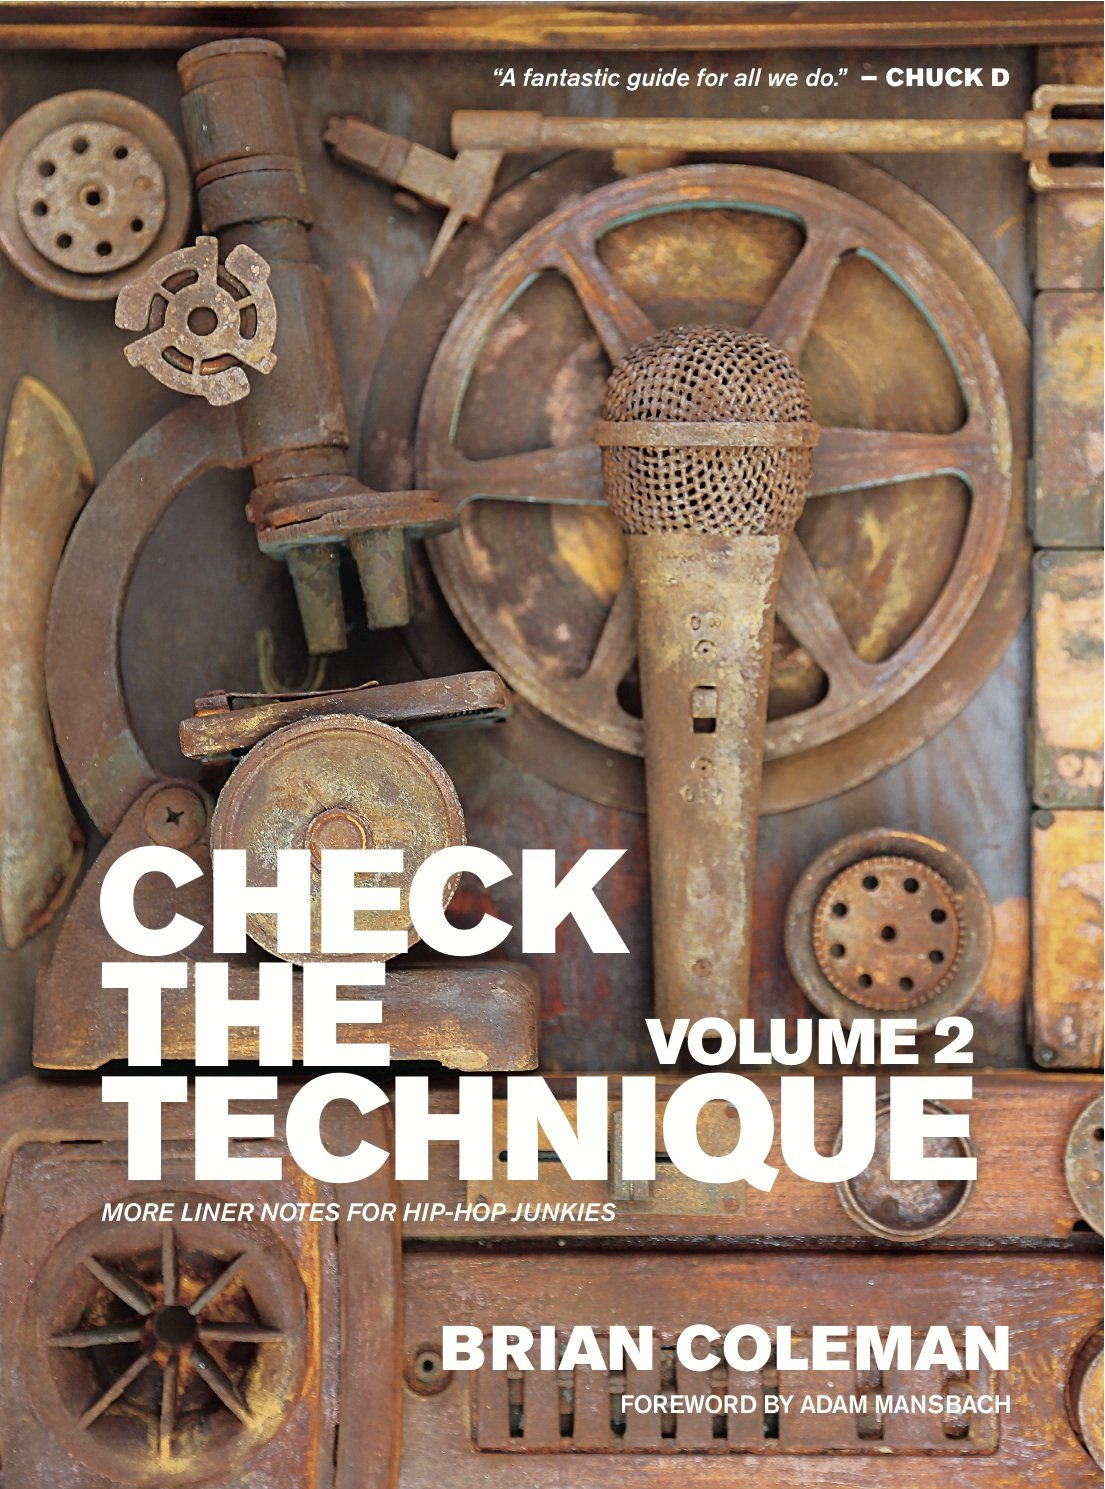 Check the Technique: Volume 2: More Liner Notes for Hip-Hop Junkies: Brian Coleman, Adam Mansbach: 9780990307600: Amazon.com: Books